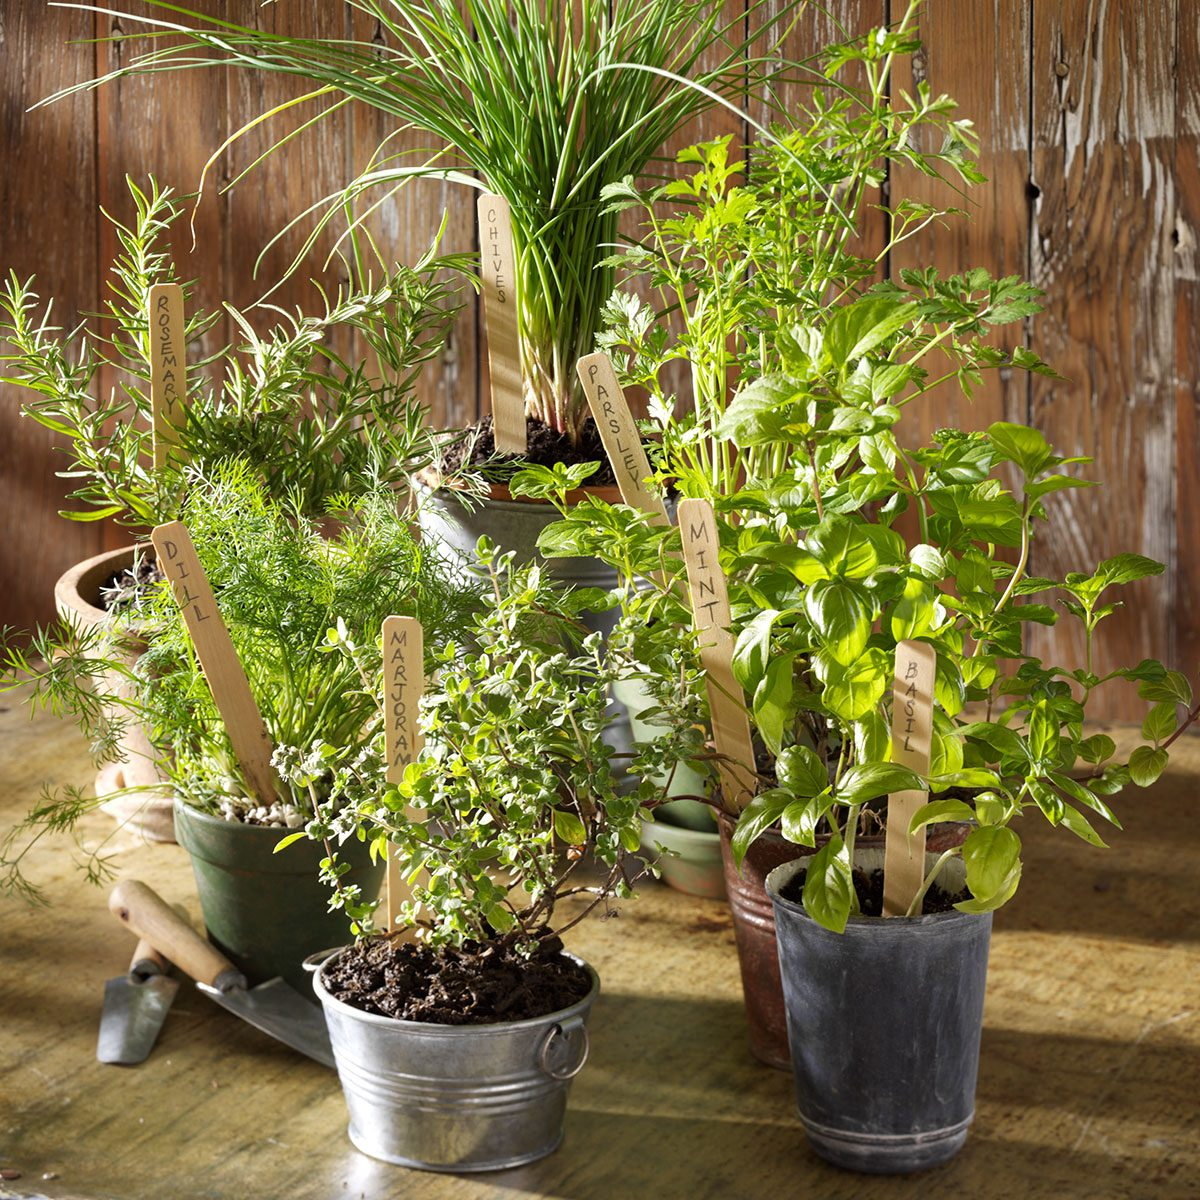 Top 10 Herbs for Your Kitchen Garden